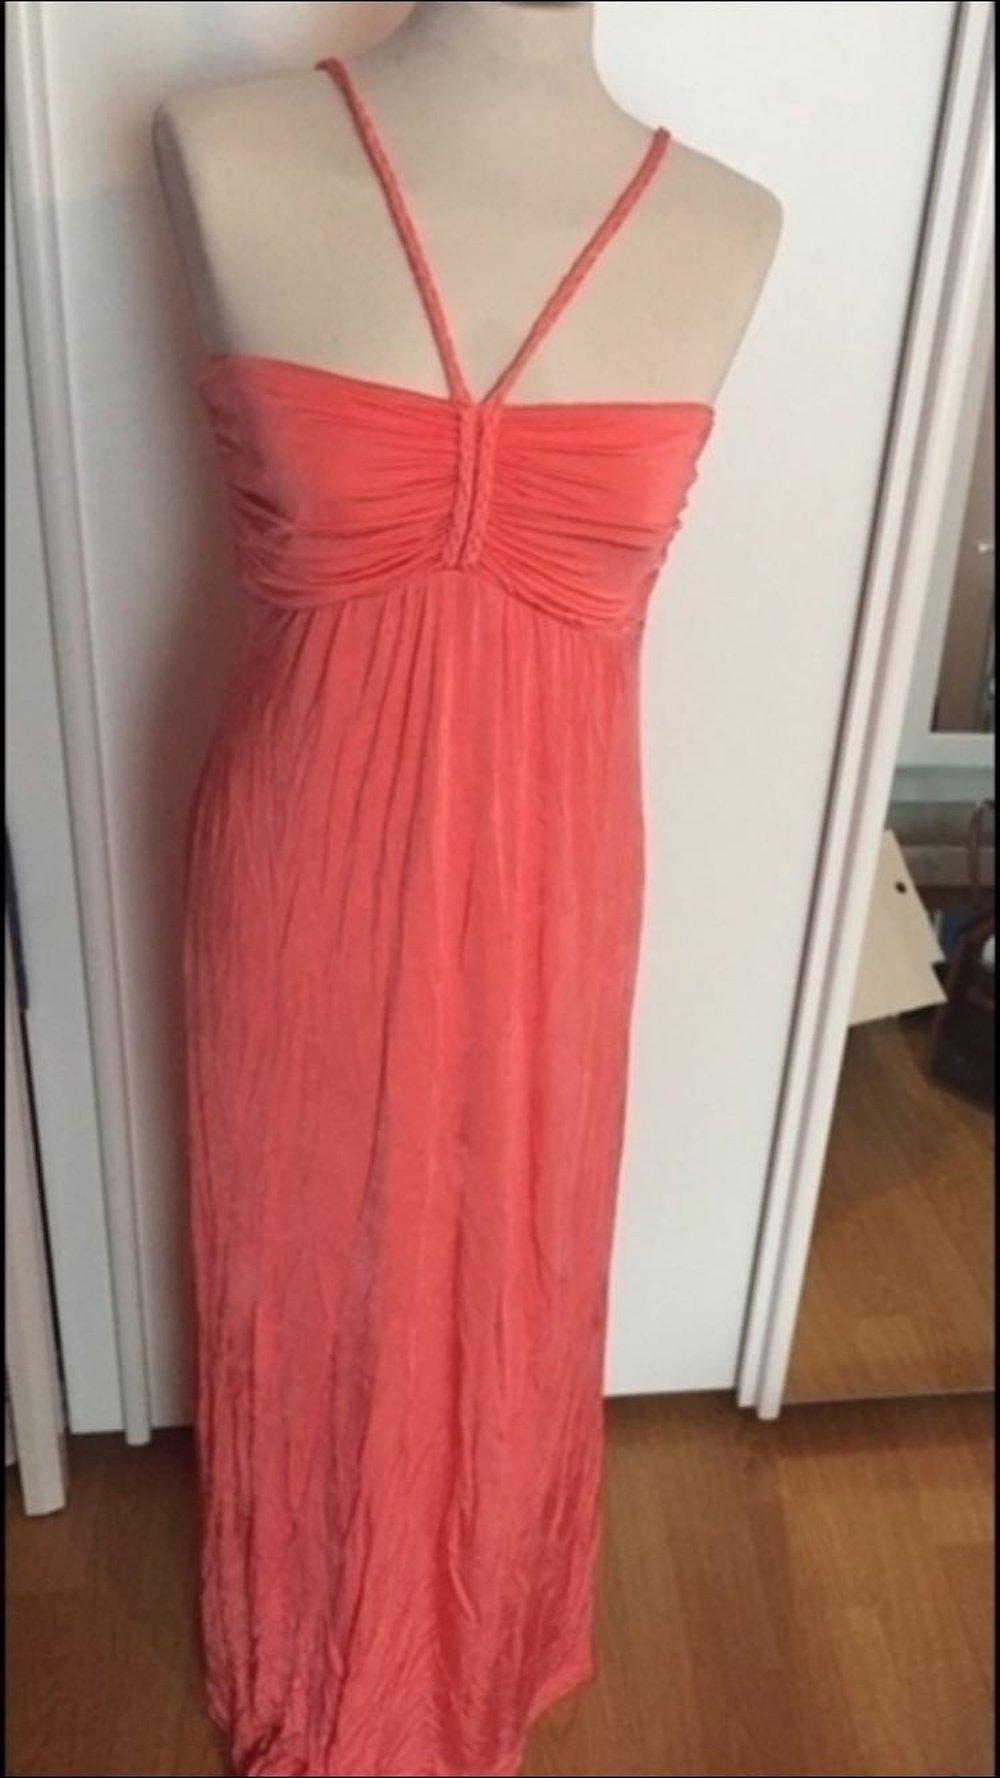 ... Mango korall langes Kleid Hochzeit Abi Abendkleid Gr. L . a37282e14d